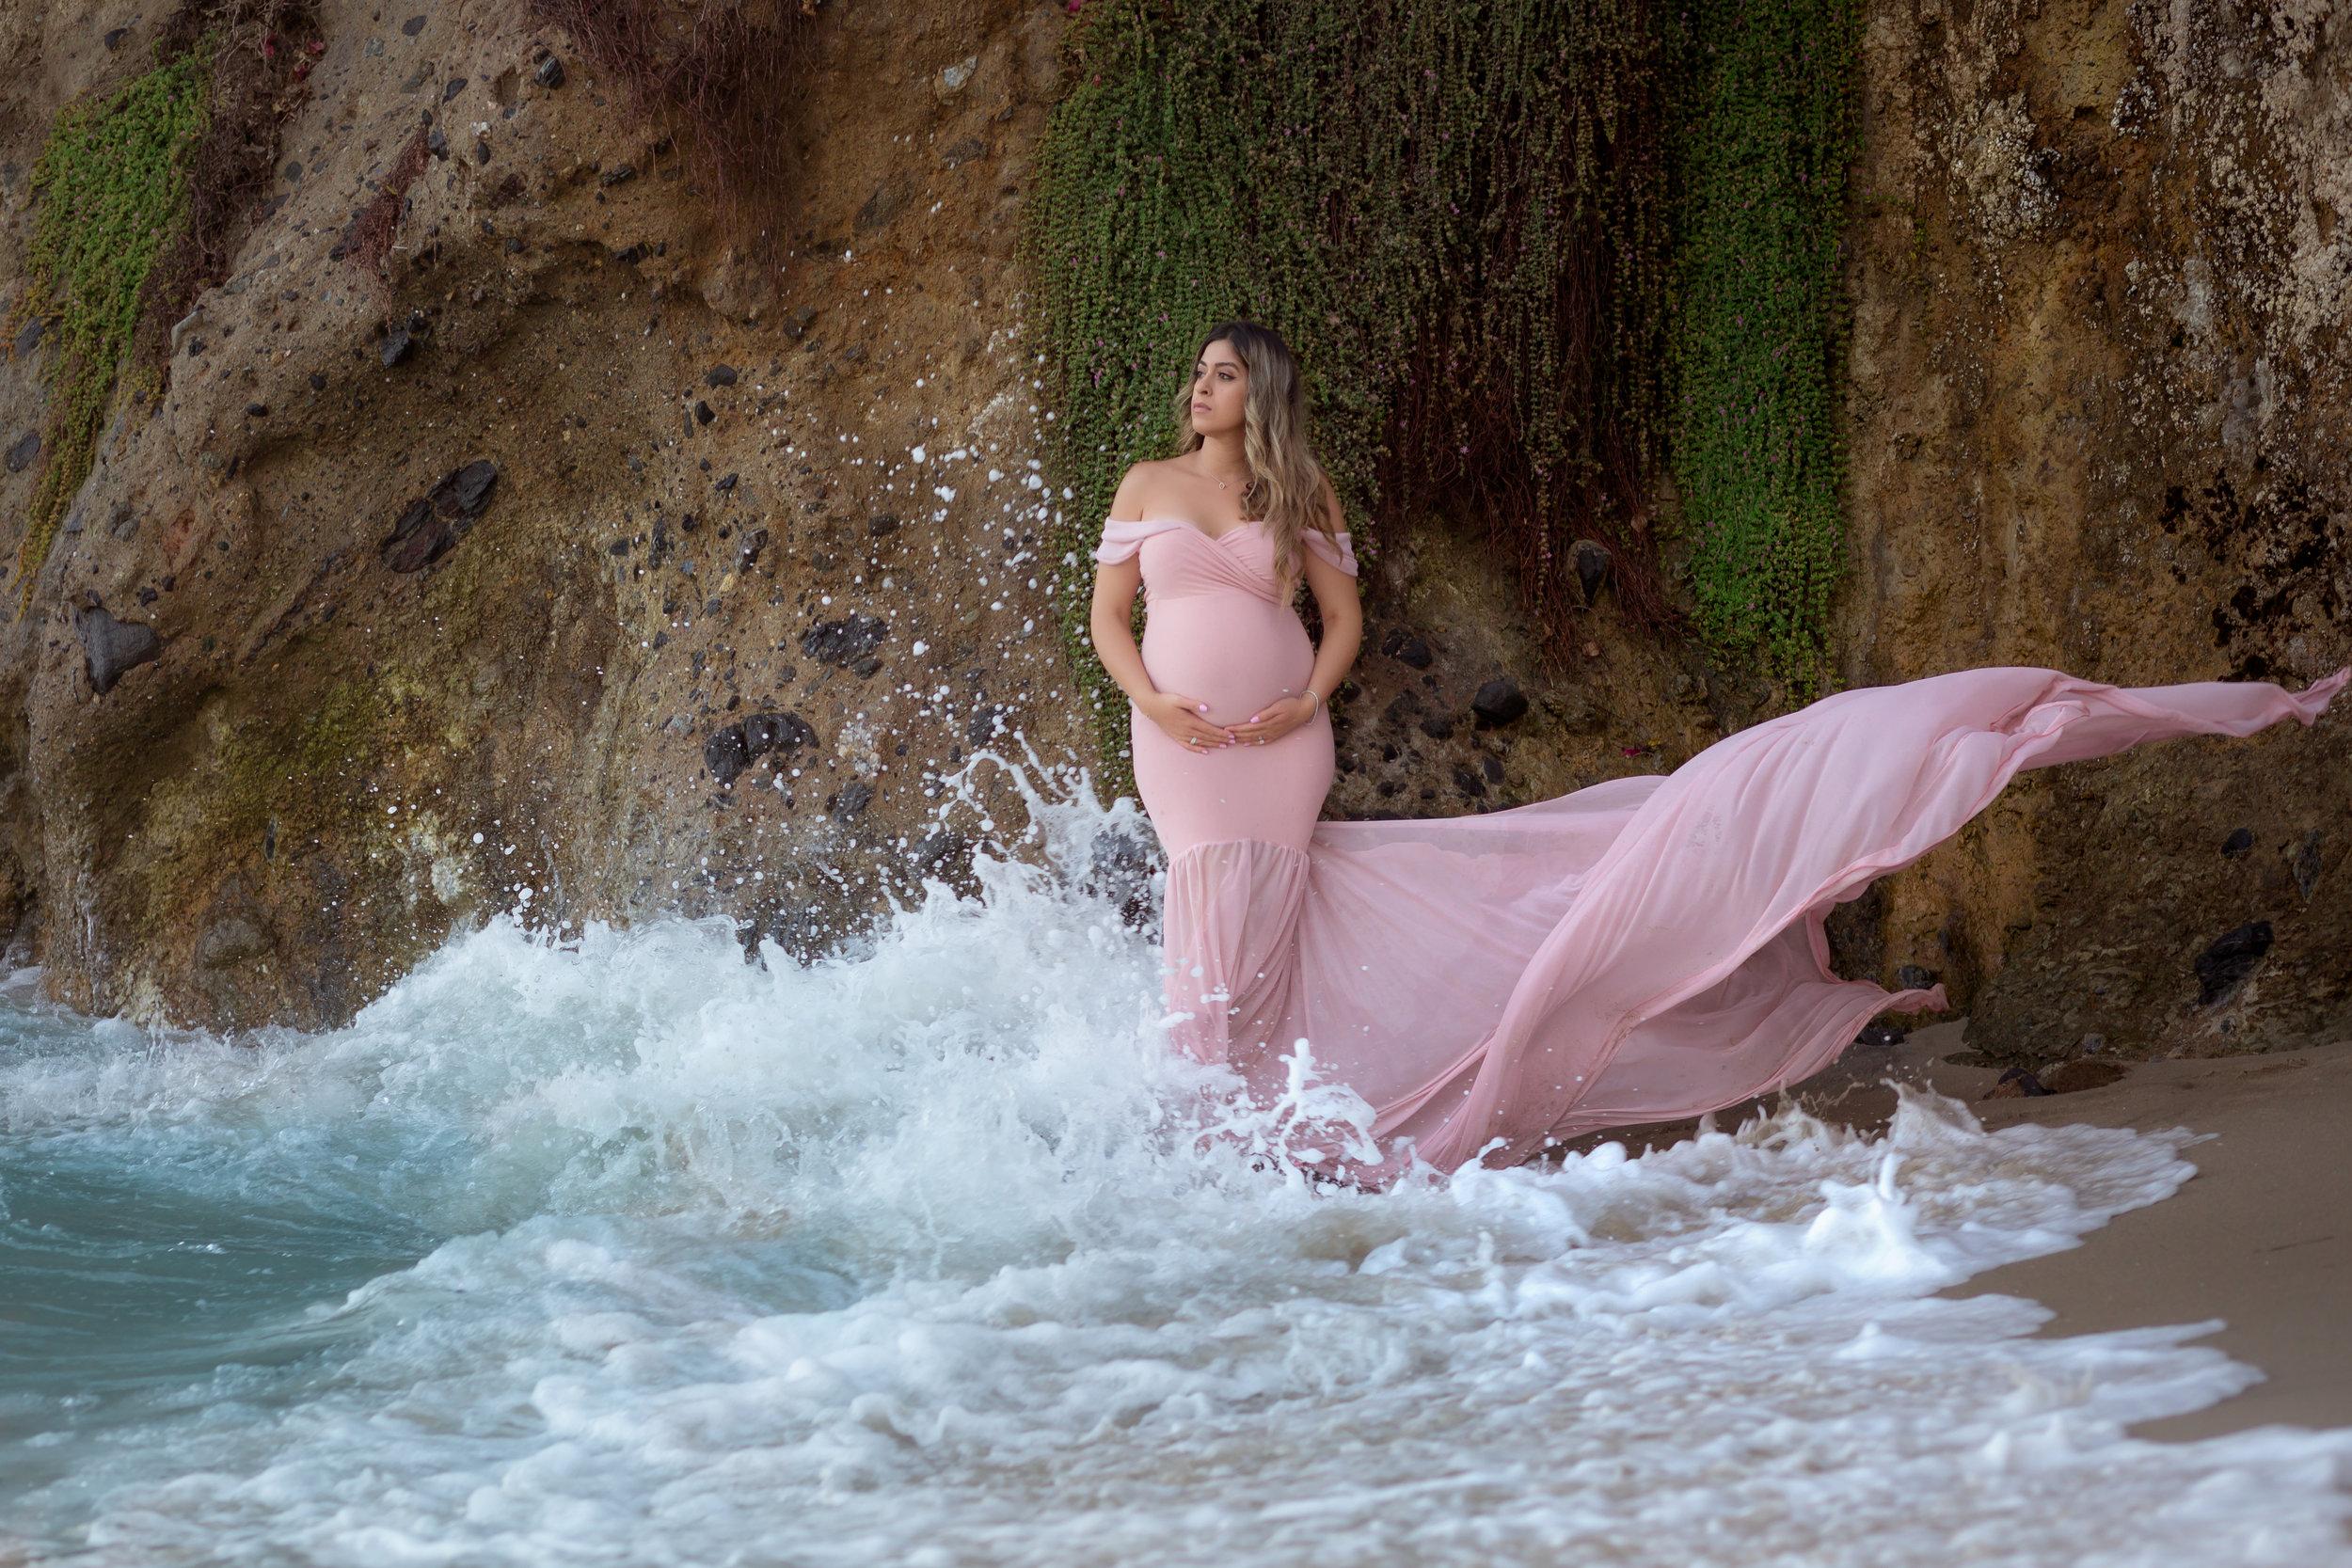 Keri-Maternity-OhMyGoddardPhotography-3.jpg